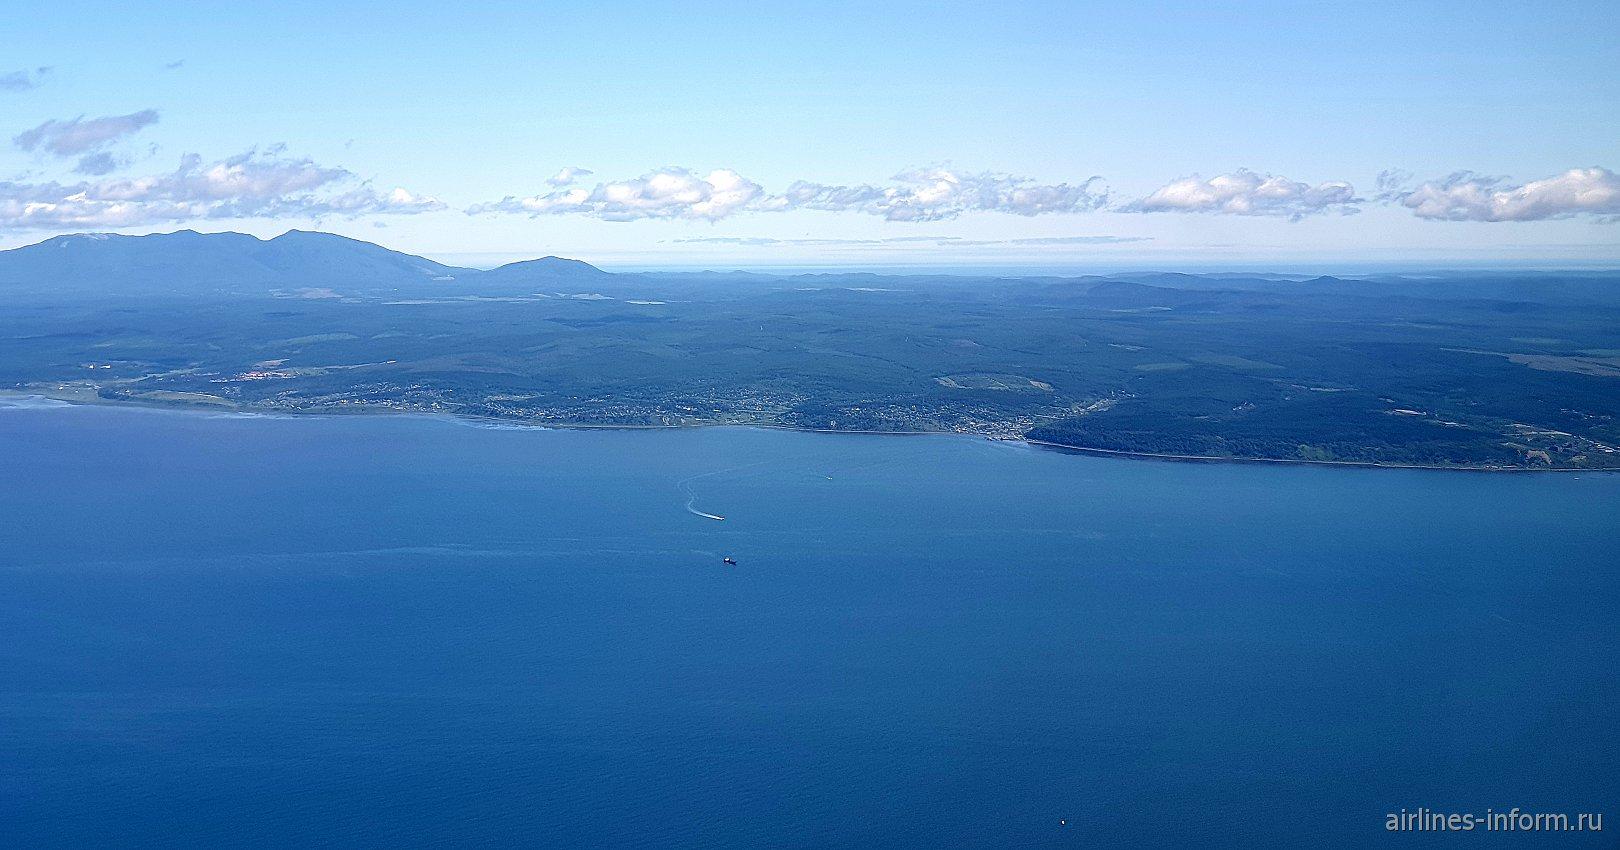 Вид из иллюминатора на побережье остров Сахалин